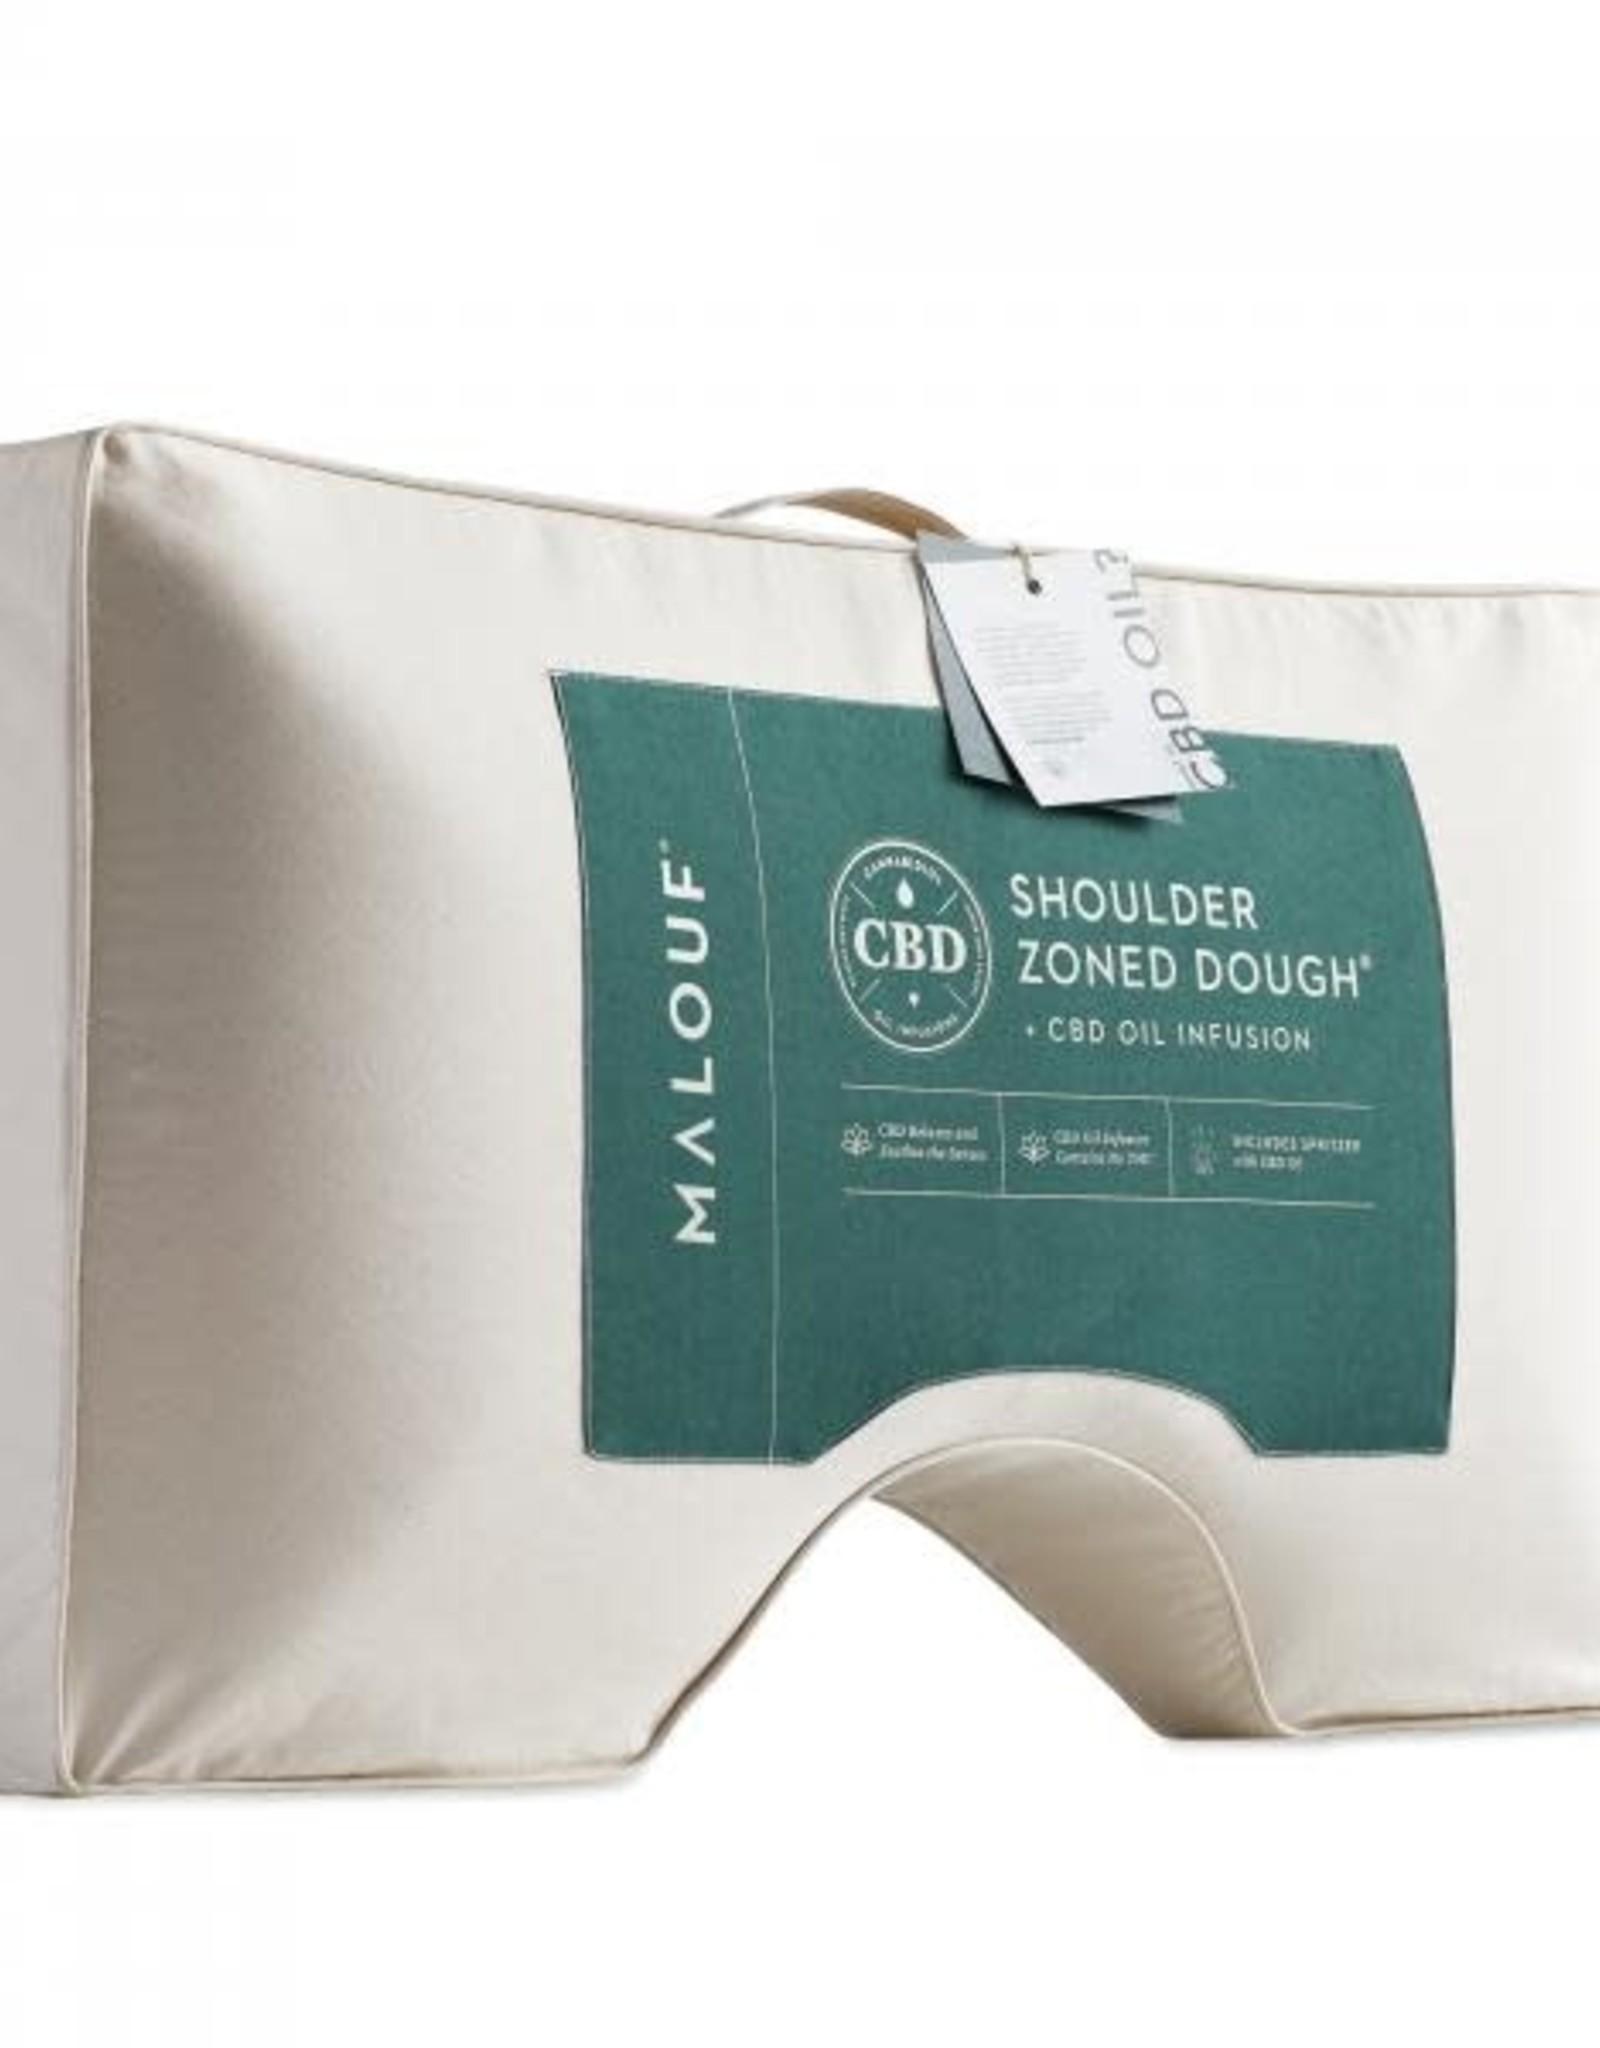 Malouf Z Shoulder Cutout Dough CBD Pillow - Mid Loft